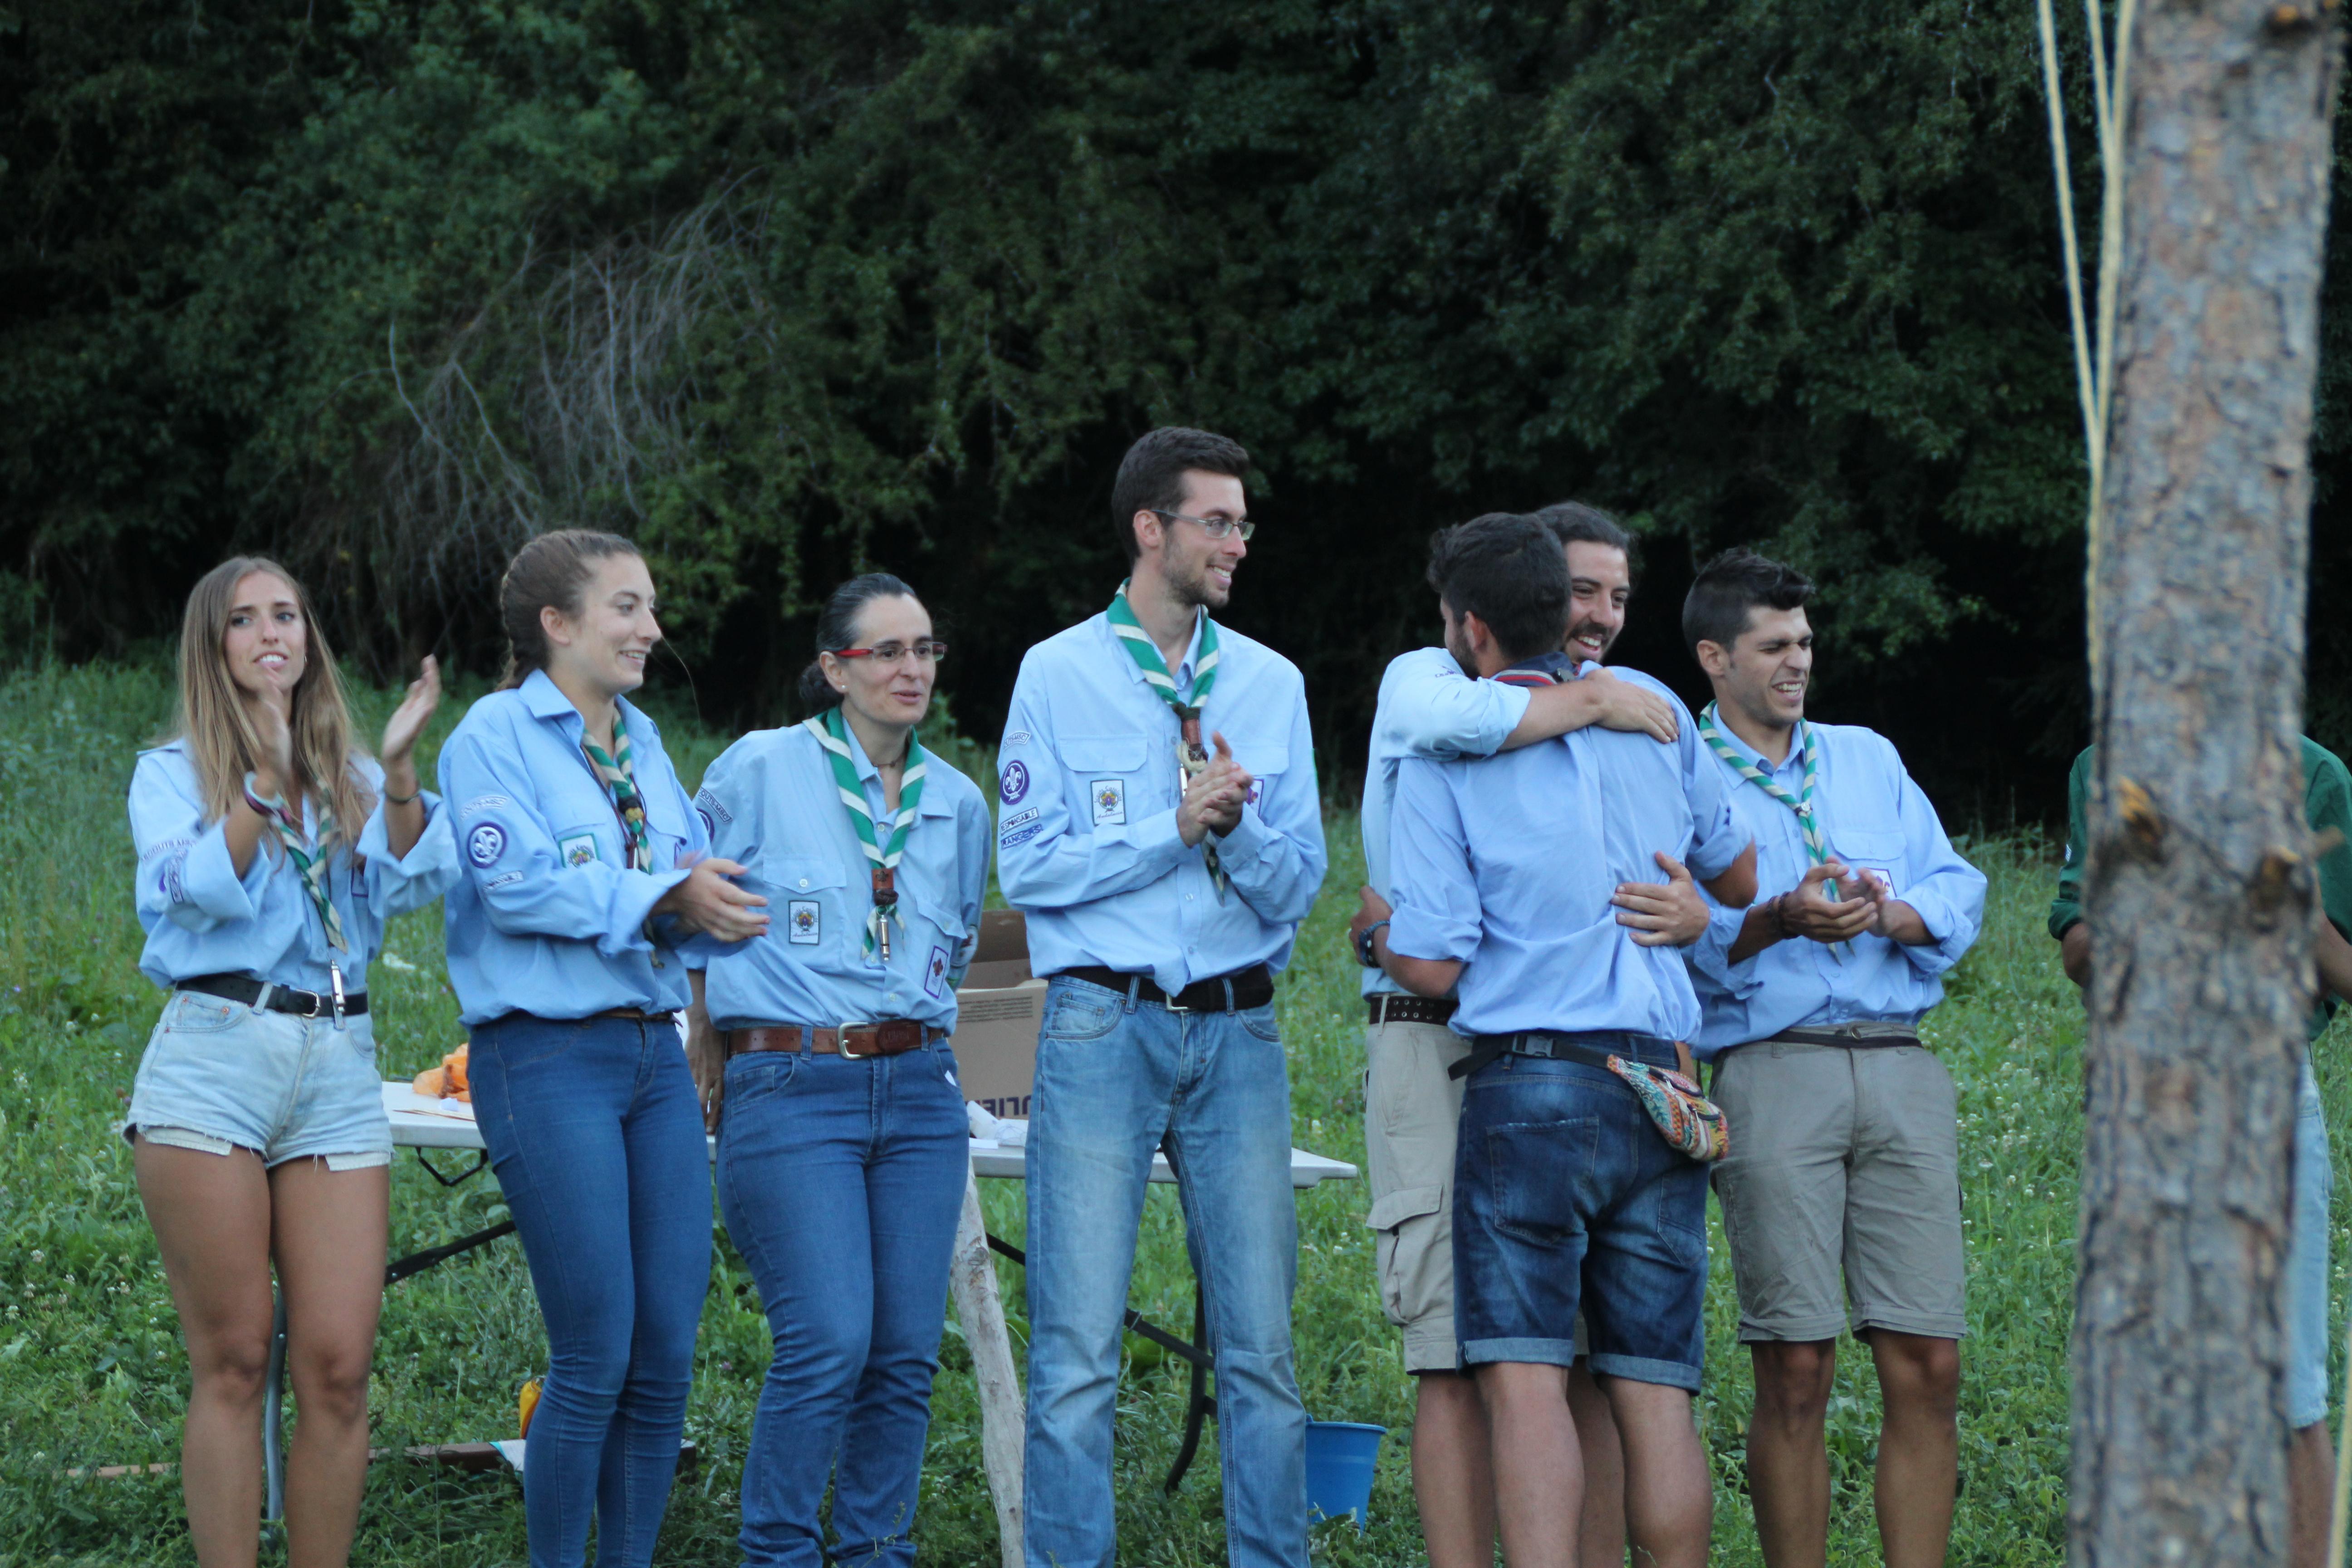 15-16 - Grupo - Campamento de verano - P398